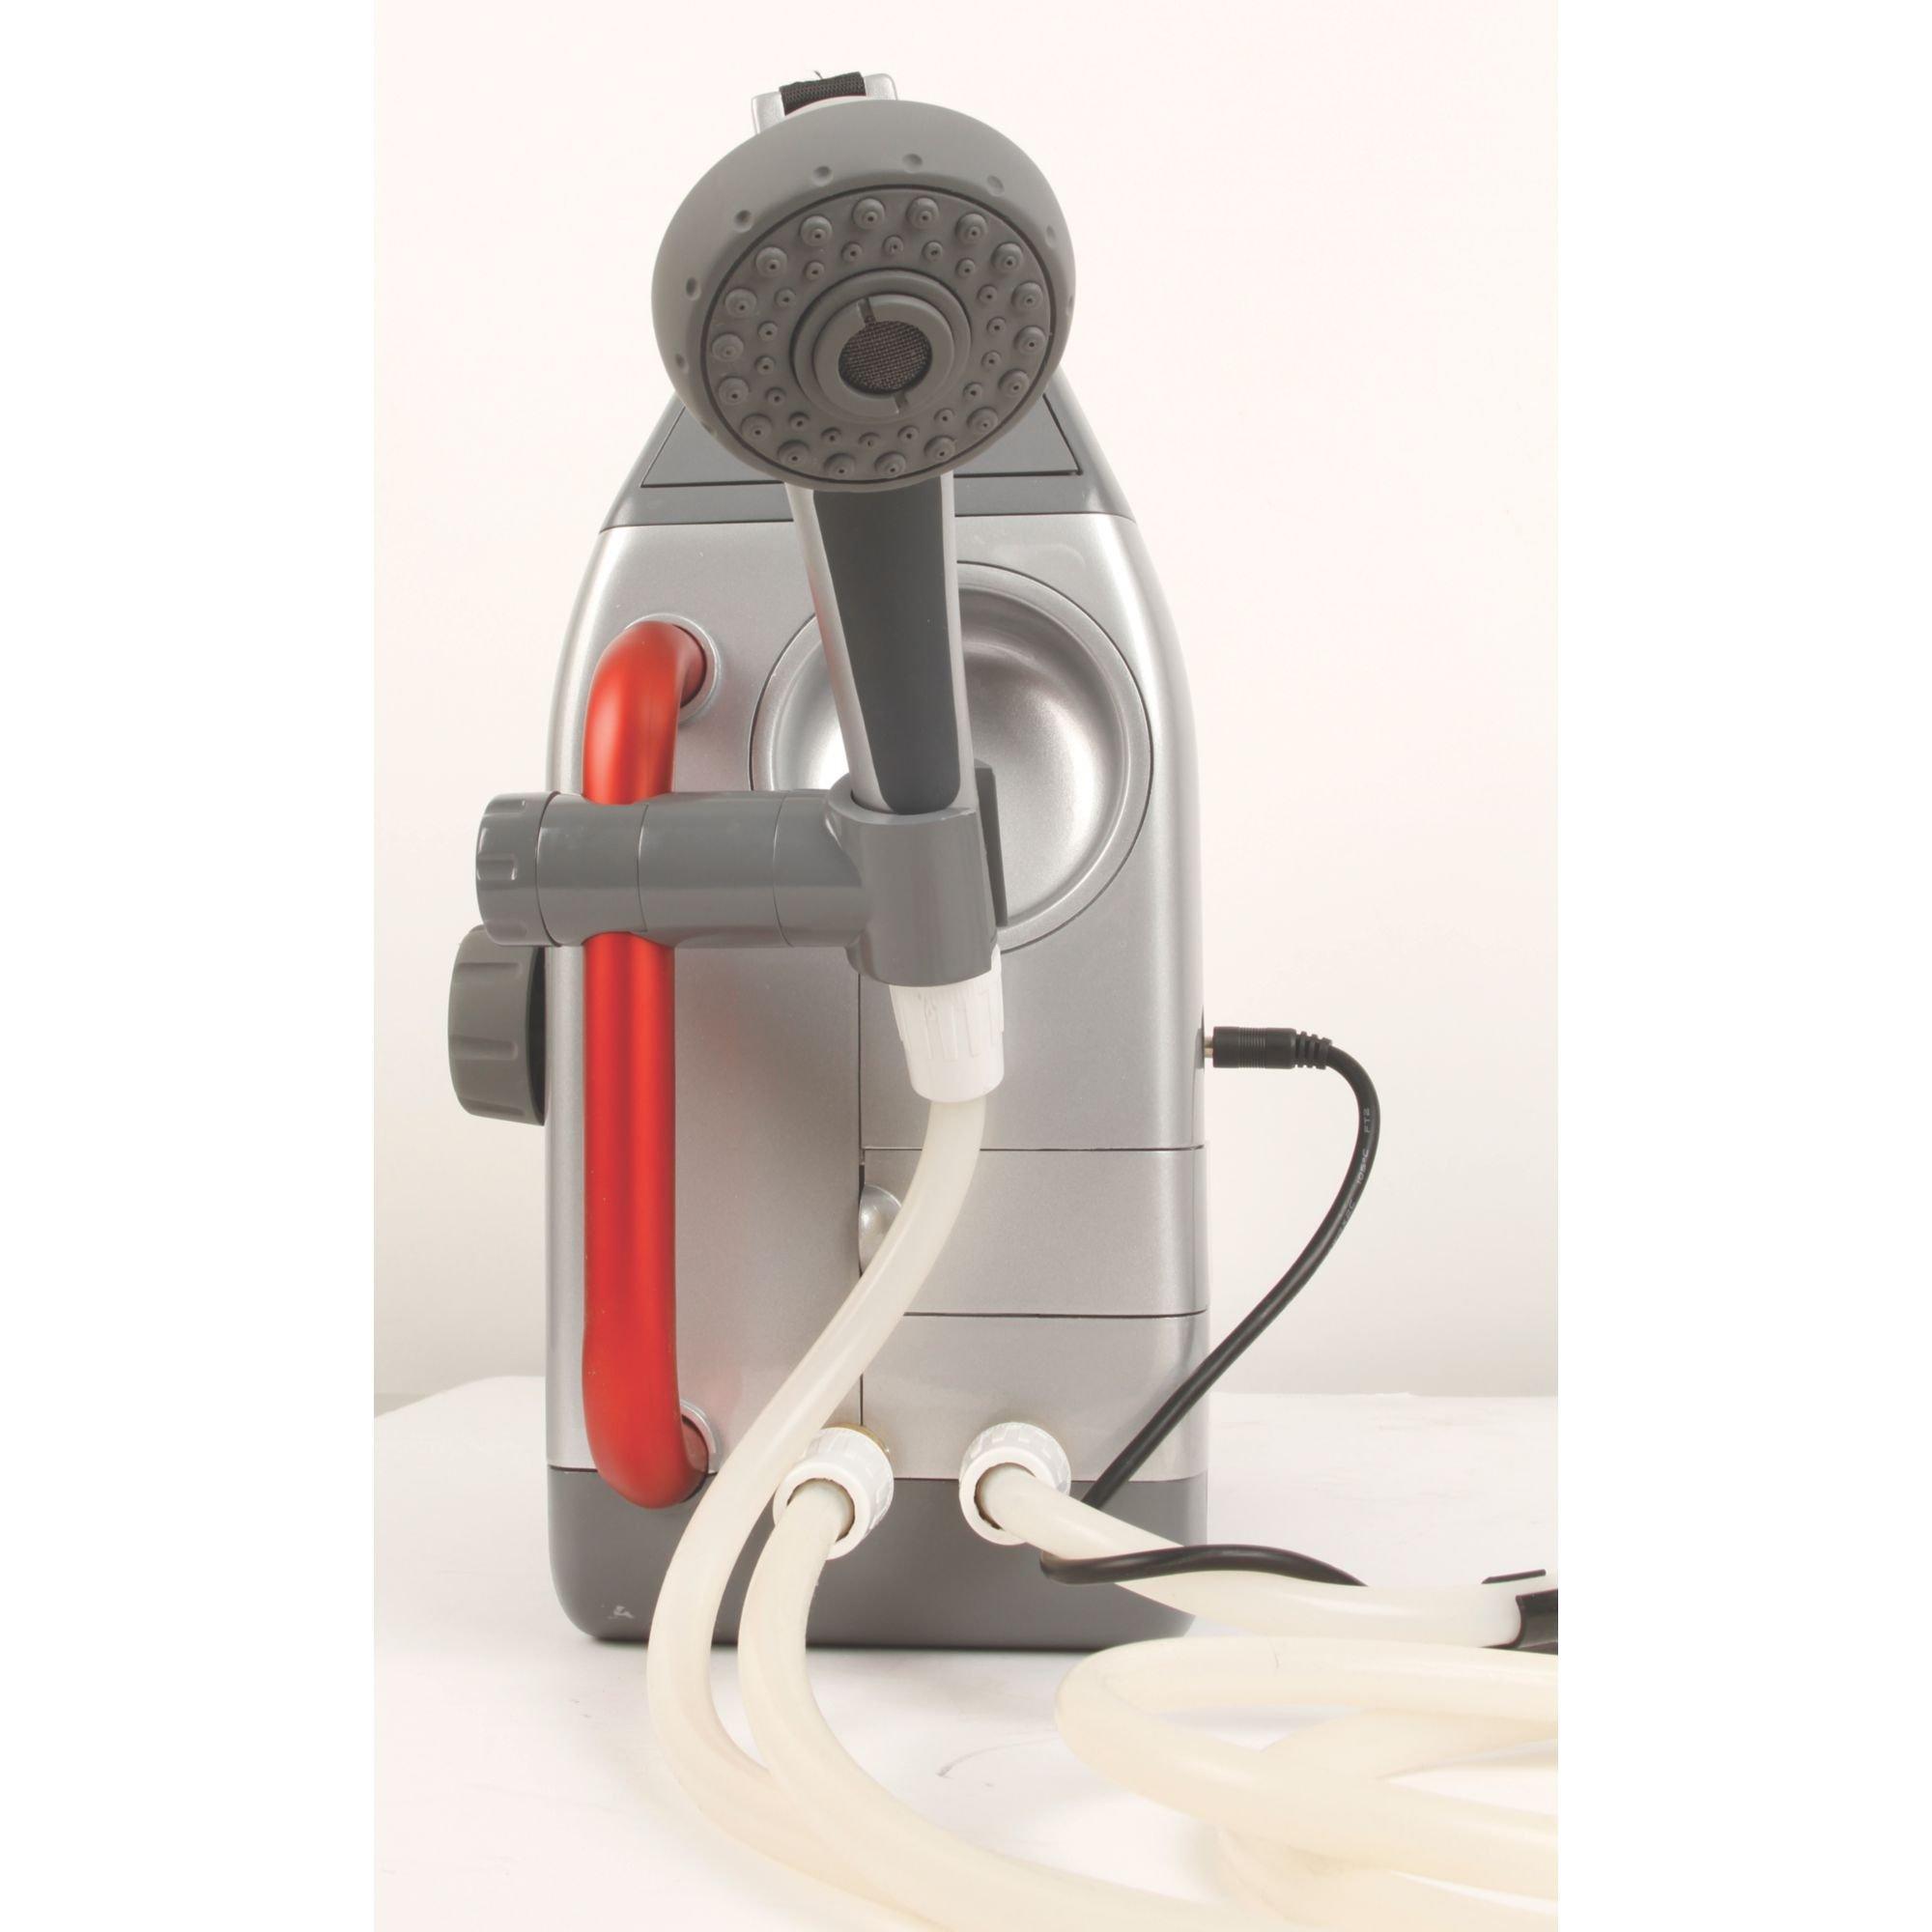 Coleman Hot Water on Demand Spray Adapter